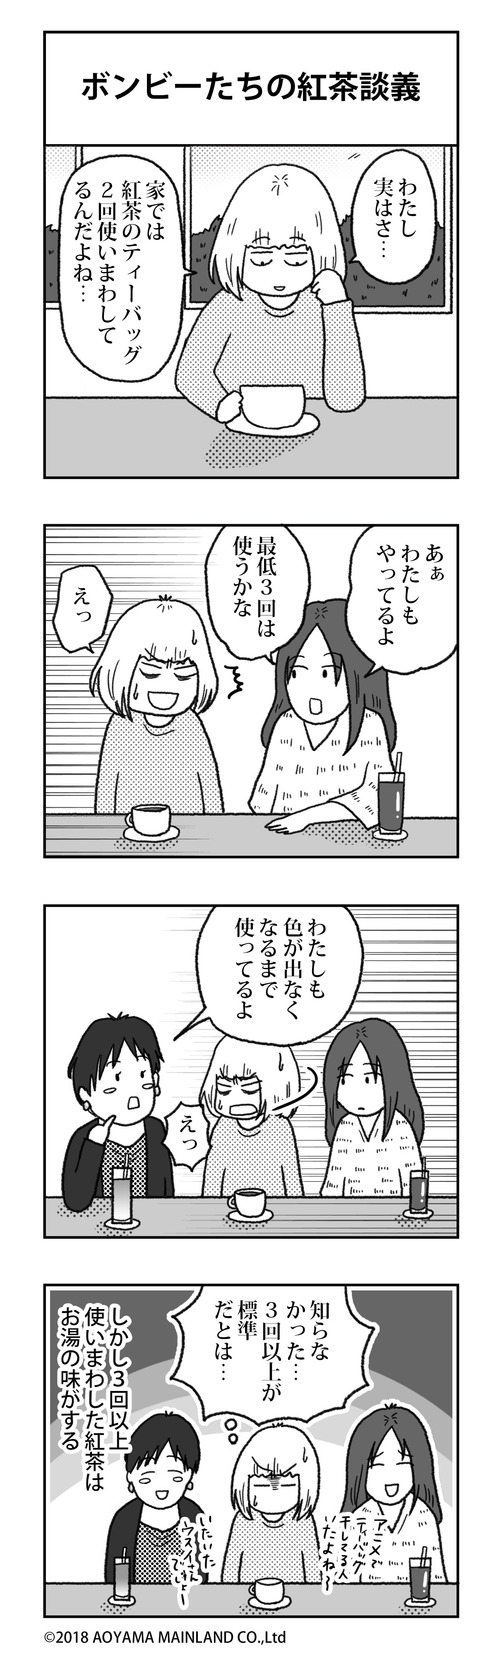 katakrico_6 のコピー